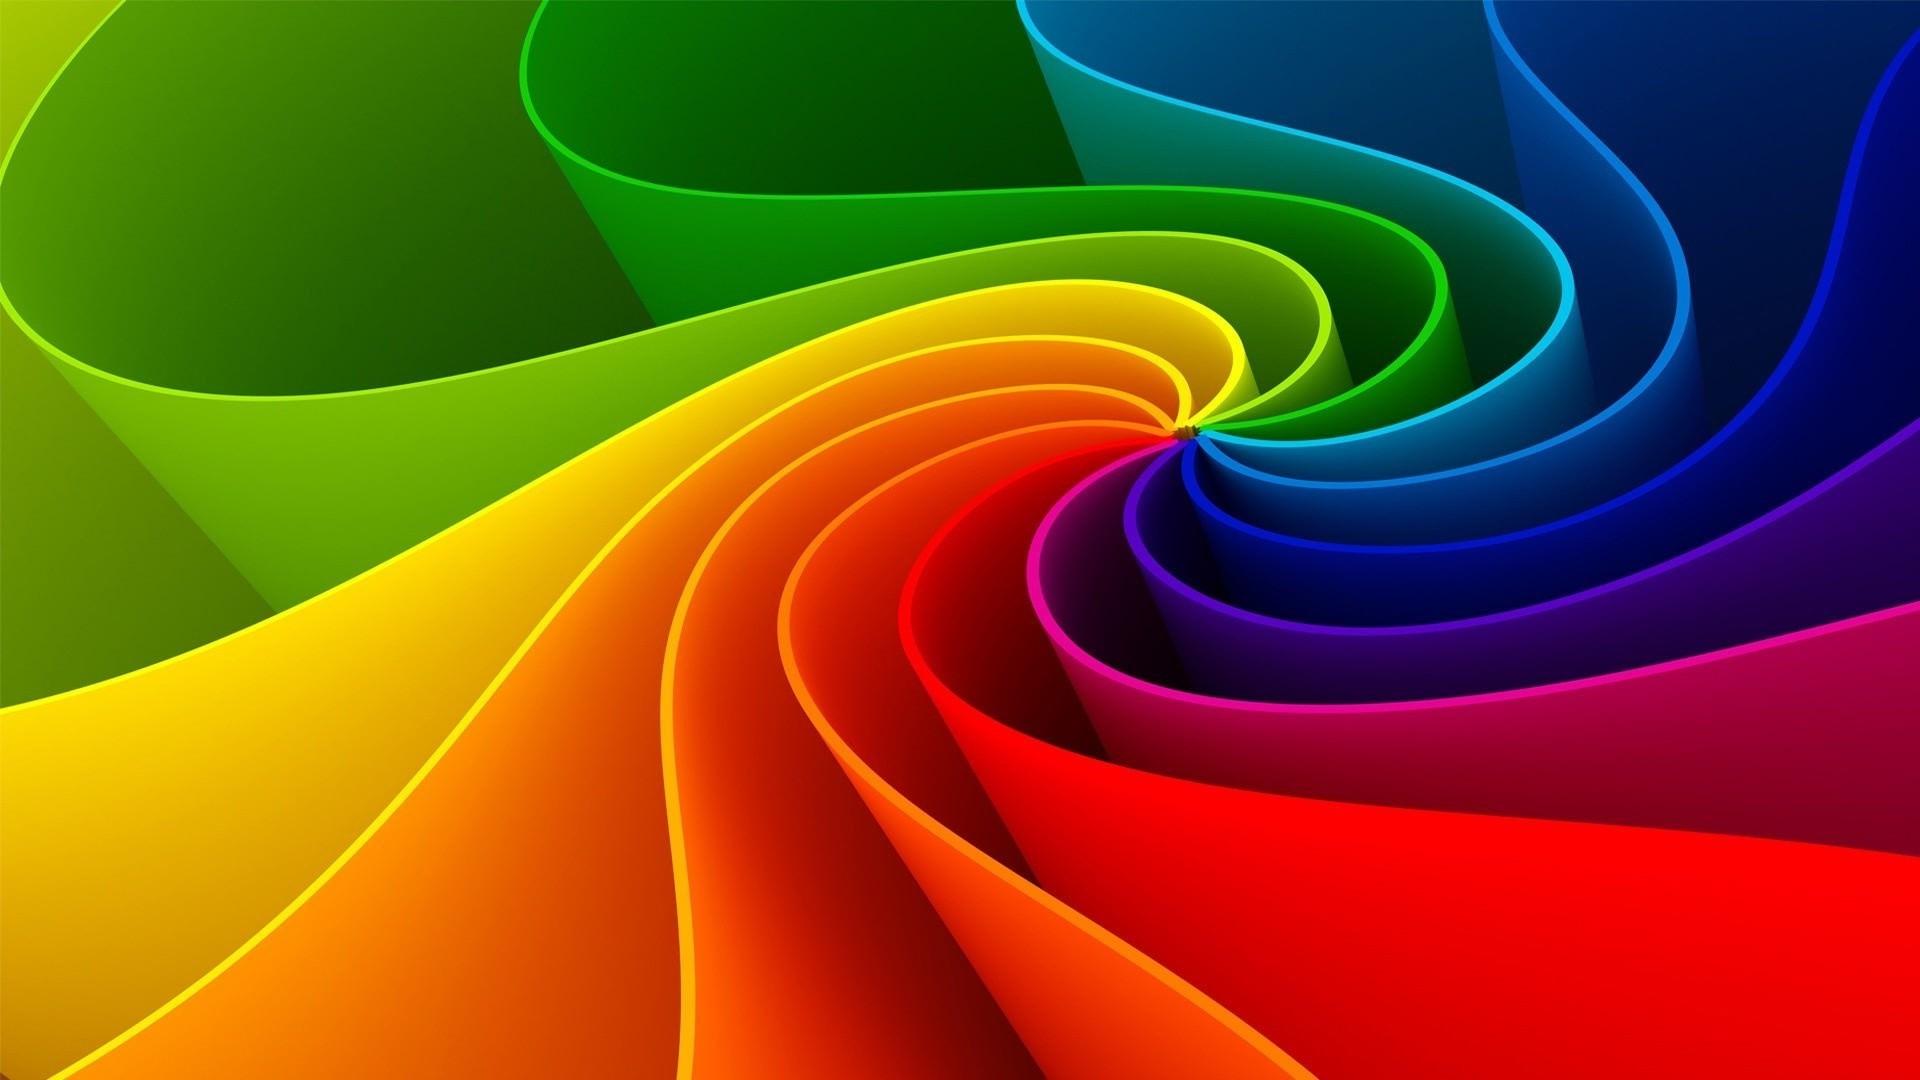 Abstract Rainbow Wallpaper